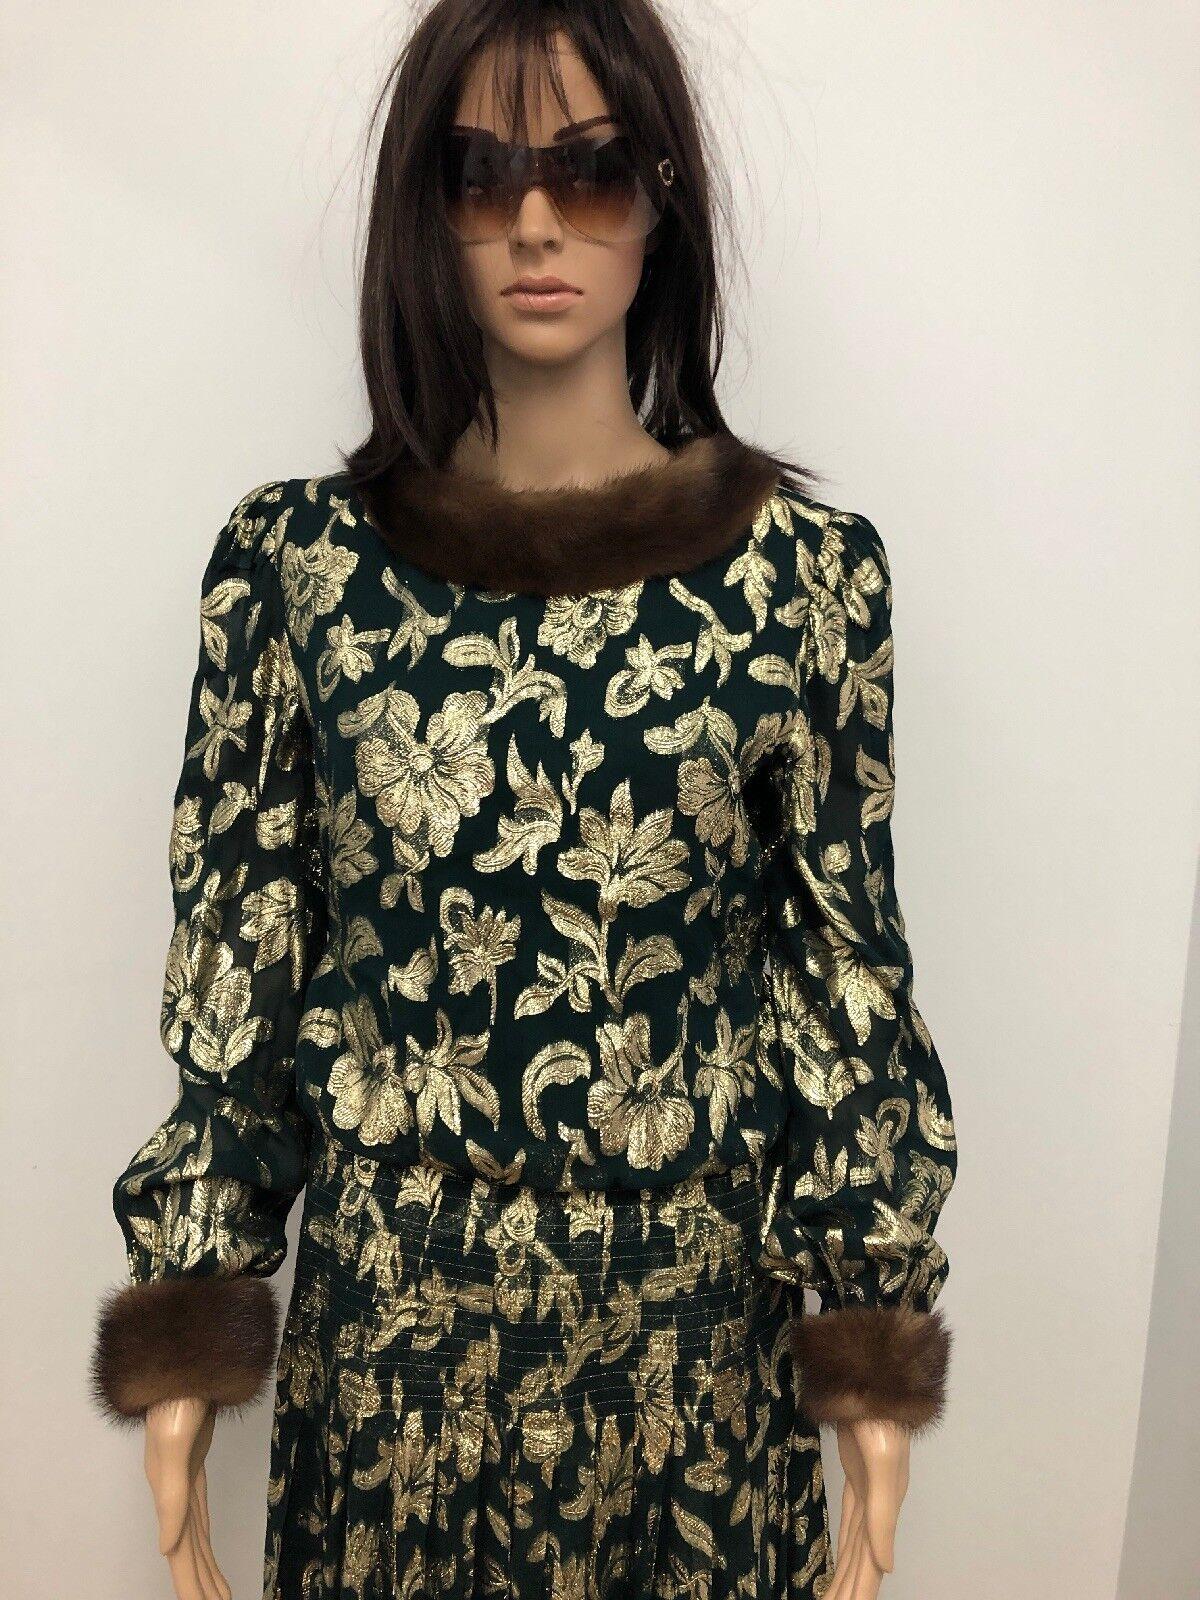 3000 Raul Raul Raul whiteo golden Green Maxi Evening Dress Mink Fur Neiman Marcus Sz.10 M 6aa344